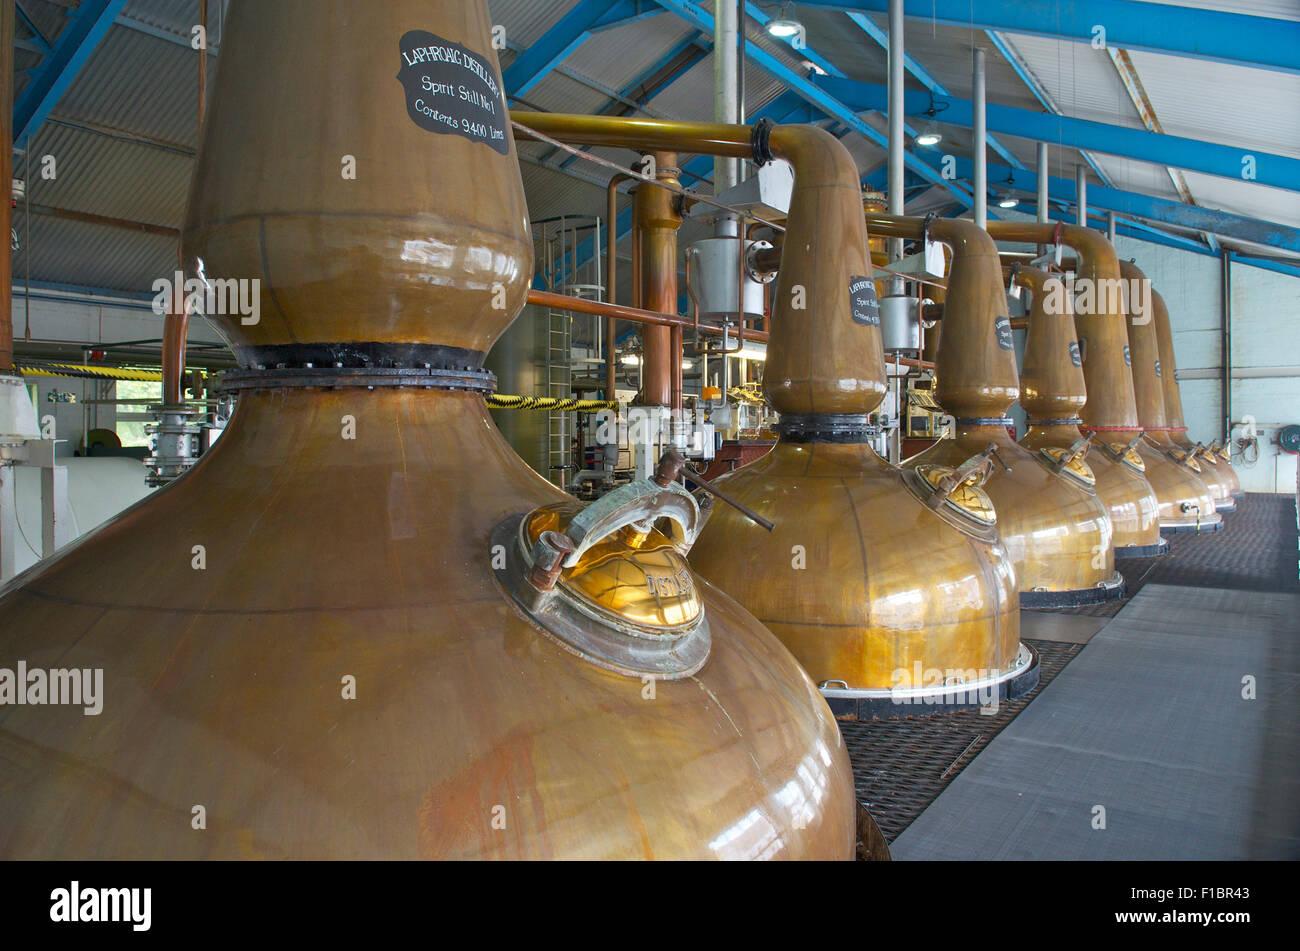 Laphroaig Whisky Distillery, Isle of Islay, Scotland, Great Britain - Stock Image